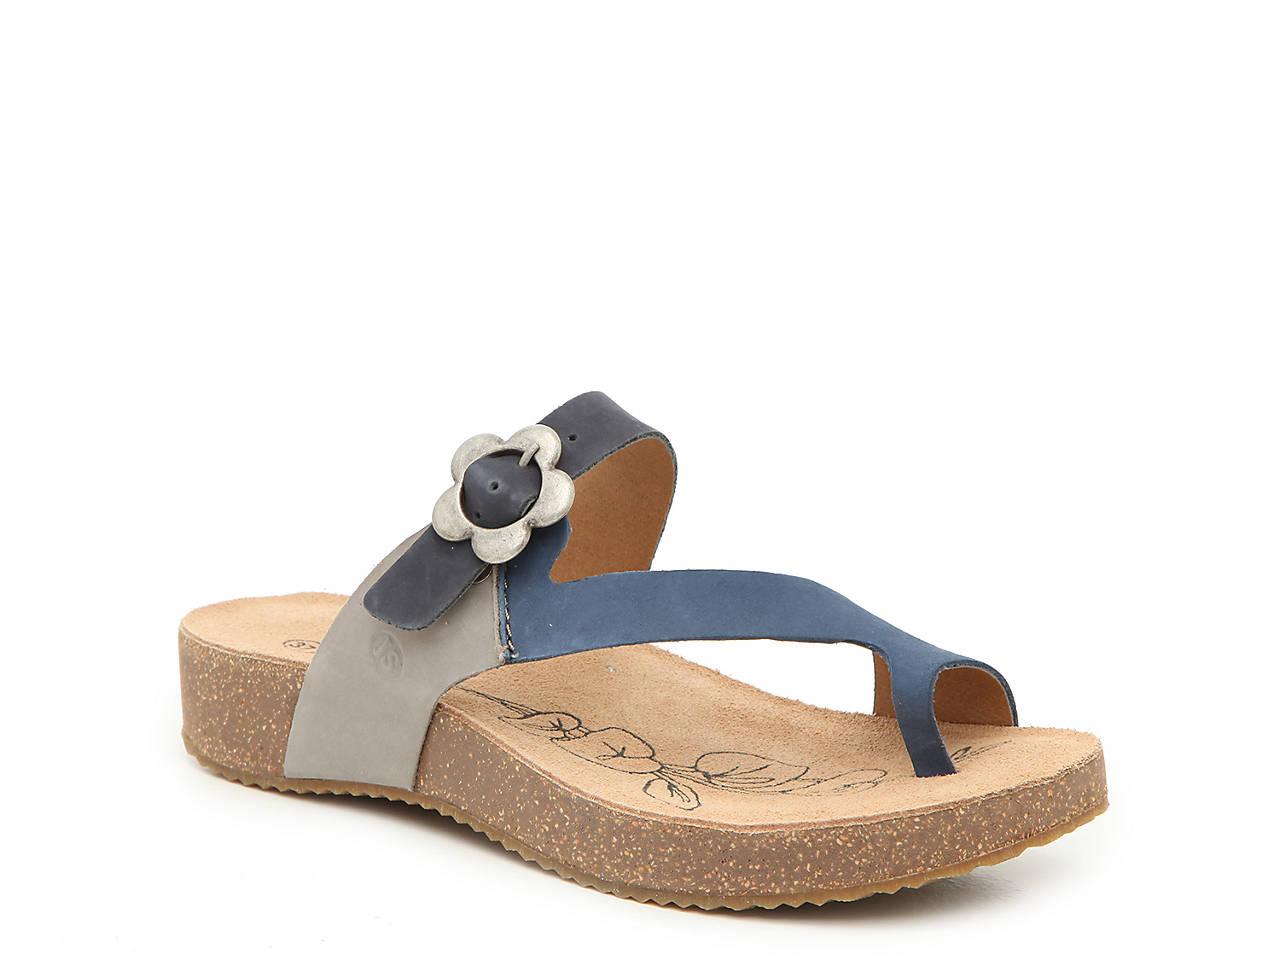 b1e1927aa441 Josef Seibel Tonga 23 Wedge Sandal Women s Shoes